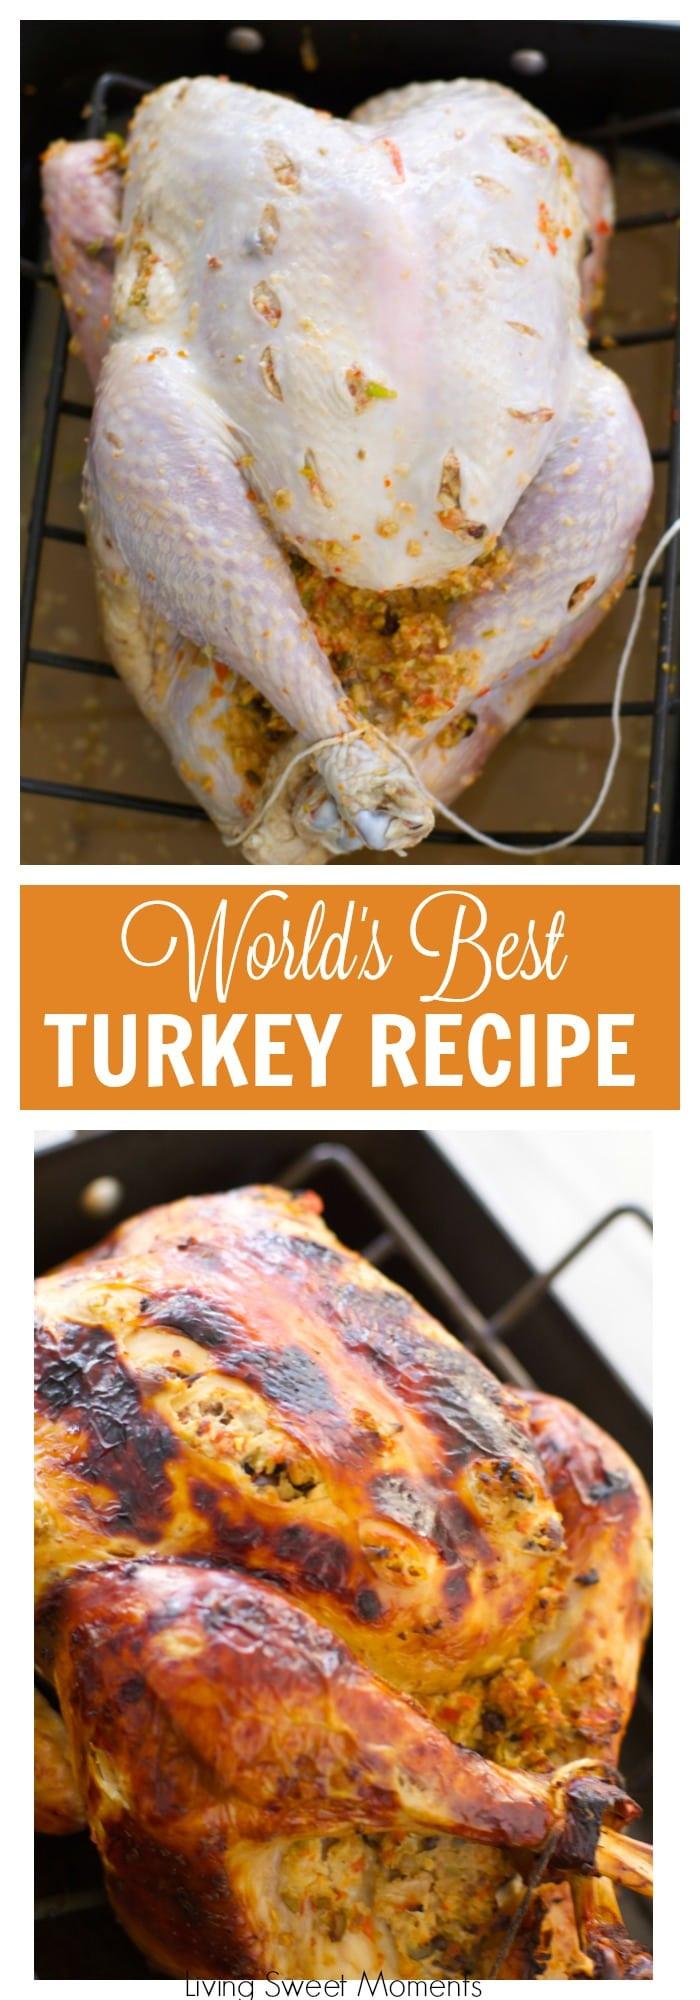 Best Turkey Recipe For Thanksgiving  The World s Best Turkey Recipe A Tutorial Living Sweet